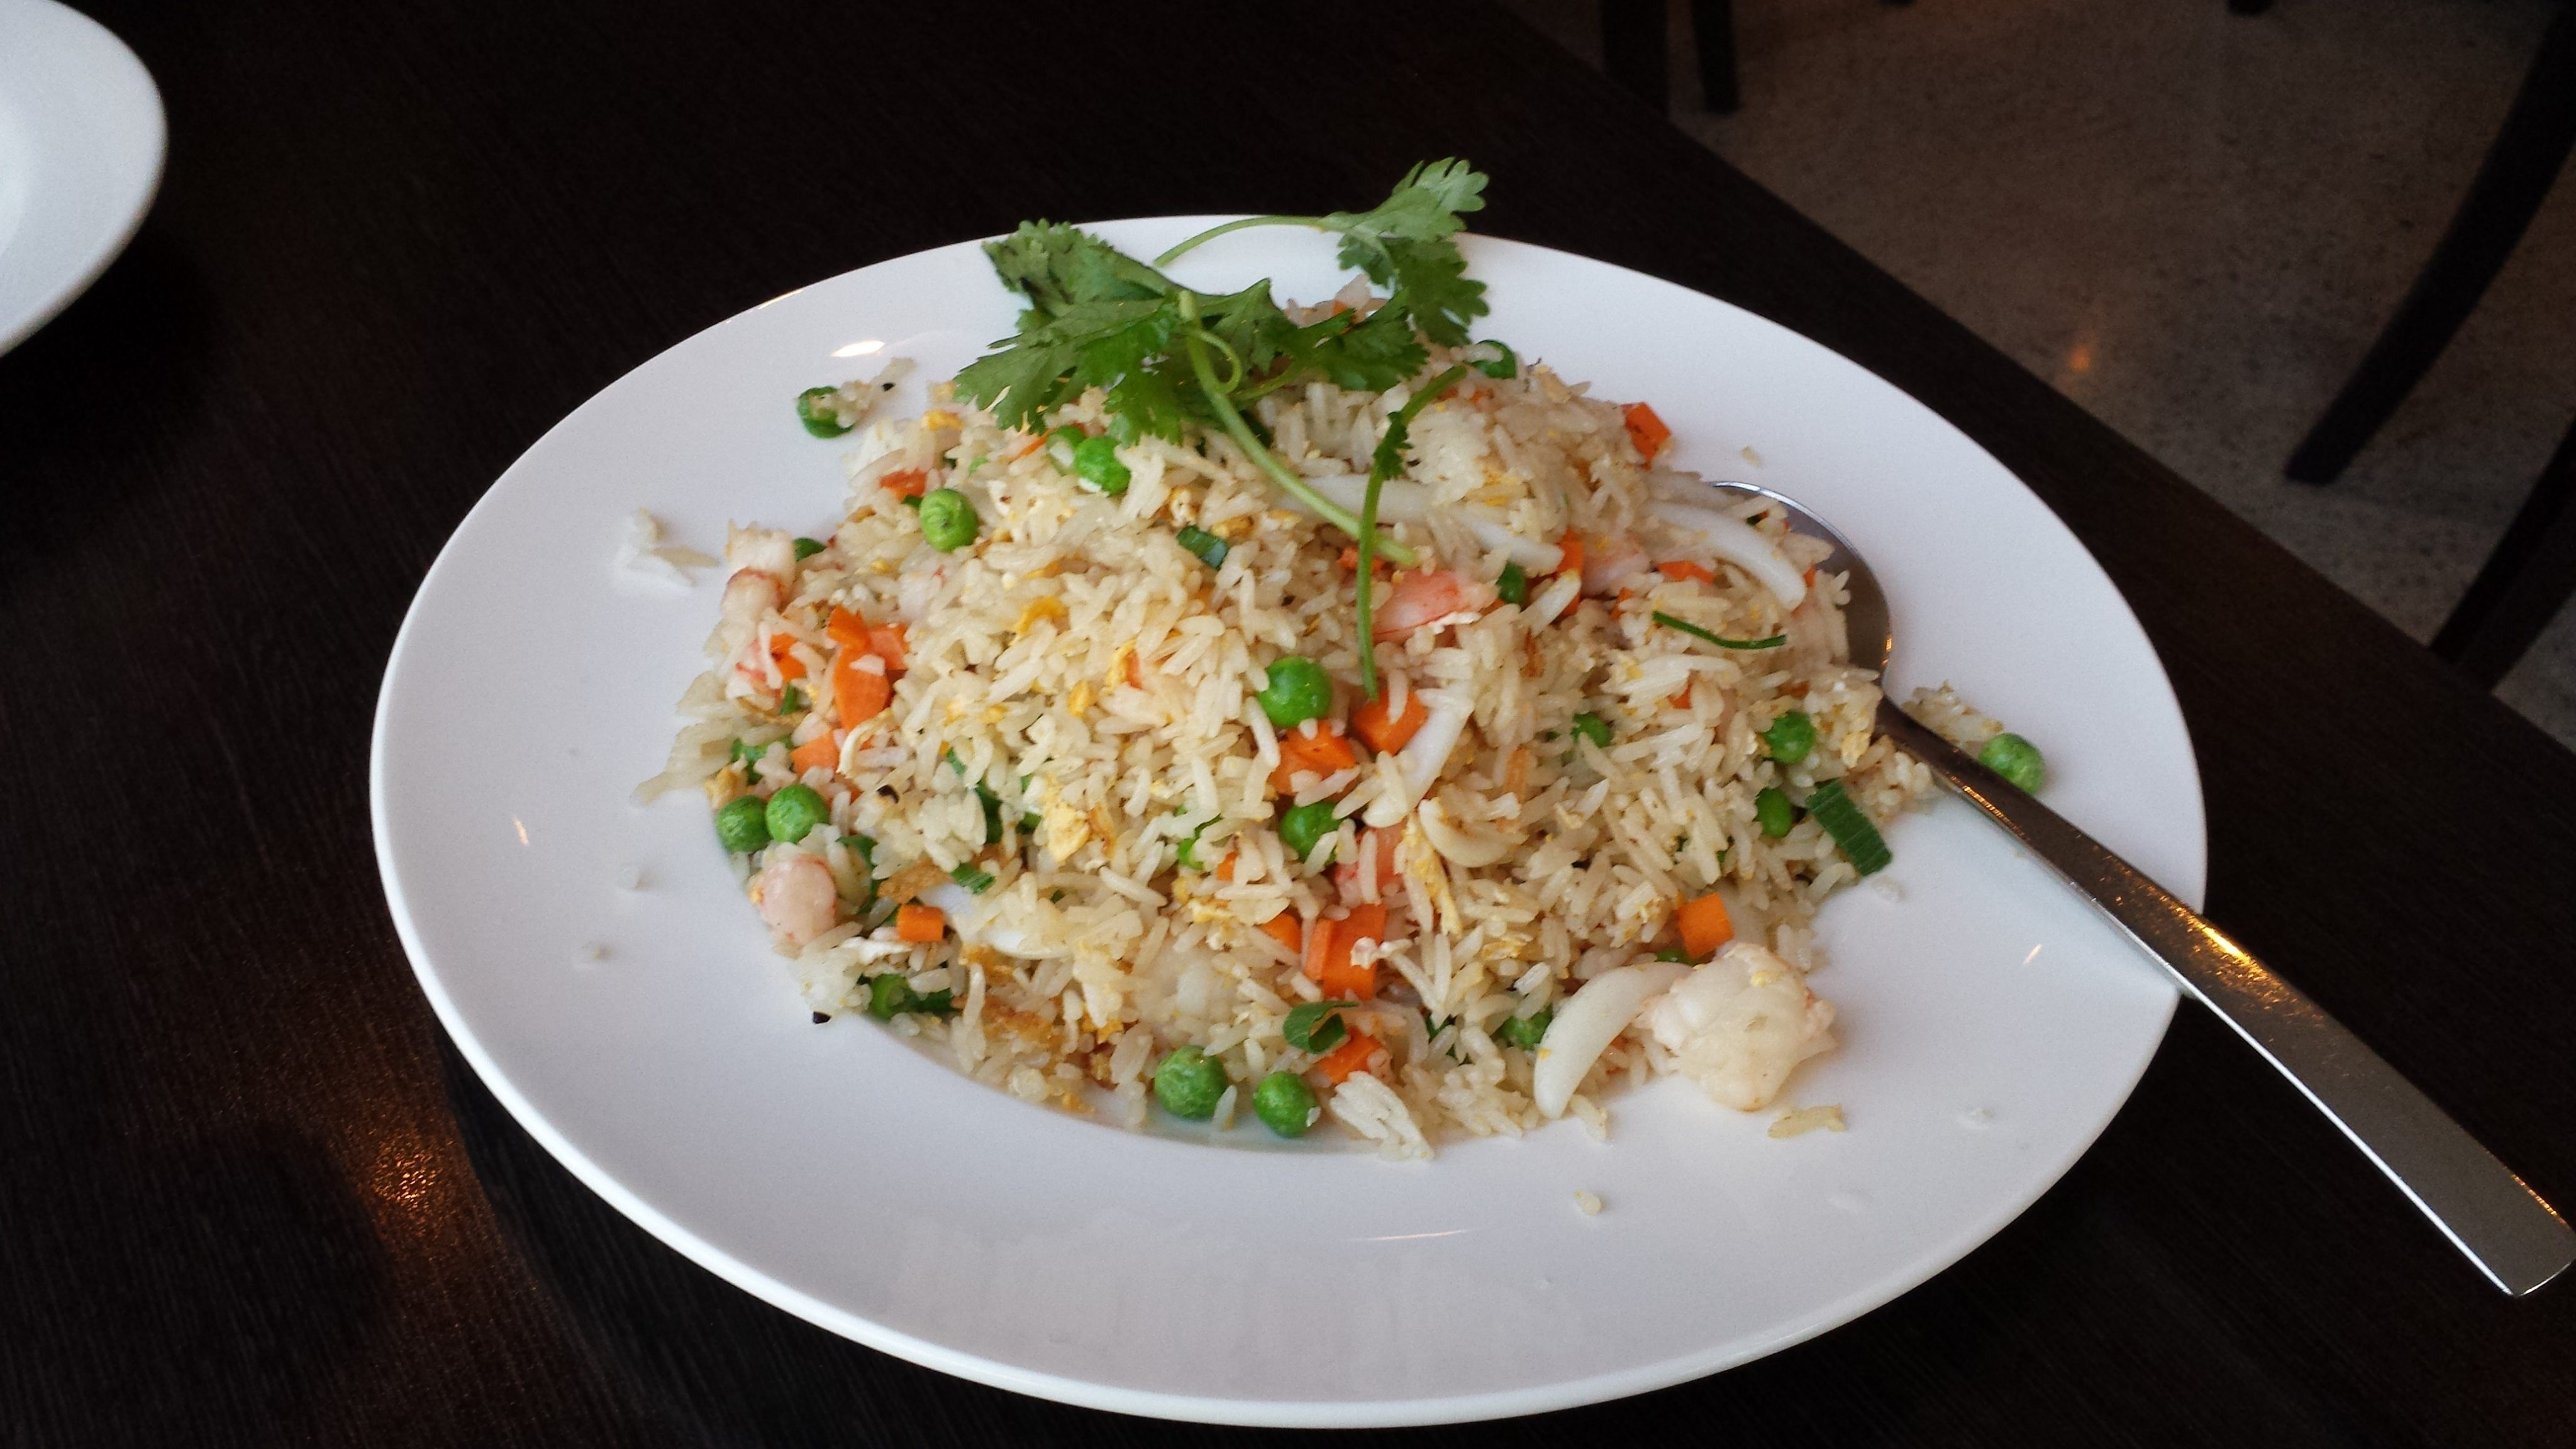 Saigon Cuisine Restaurant | Greensboro Convention and Visitors Bureau